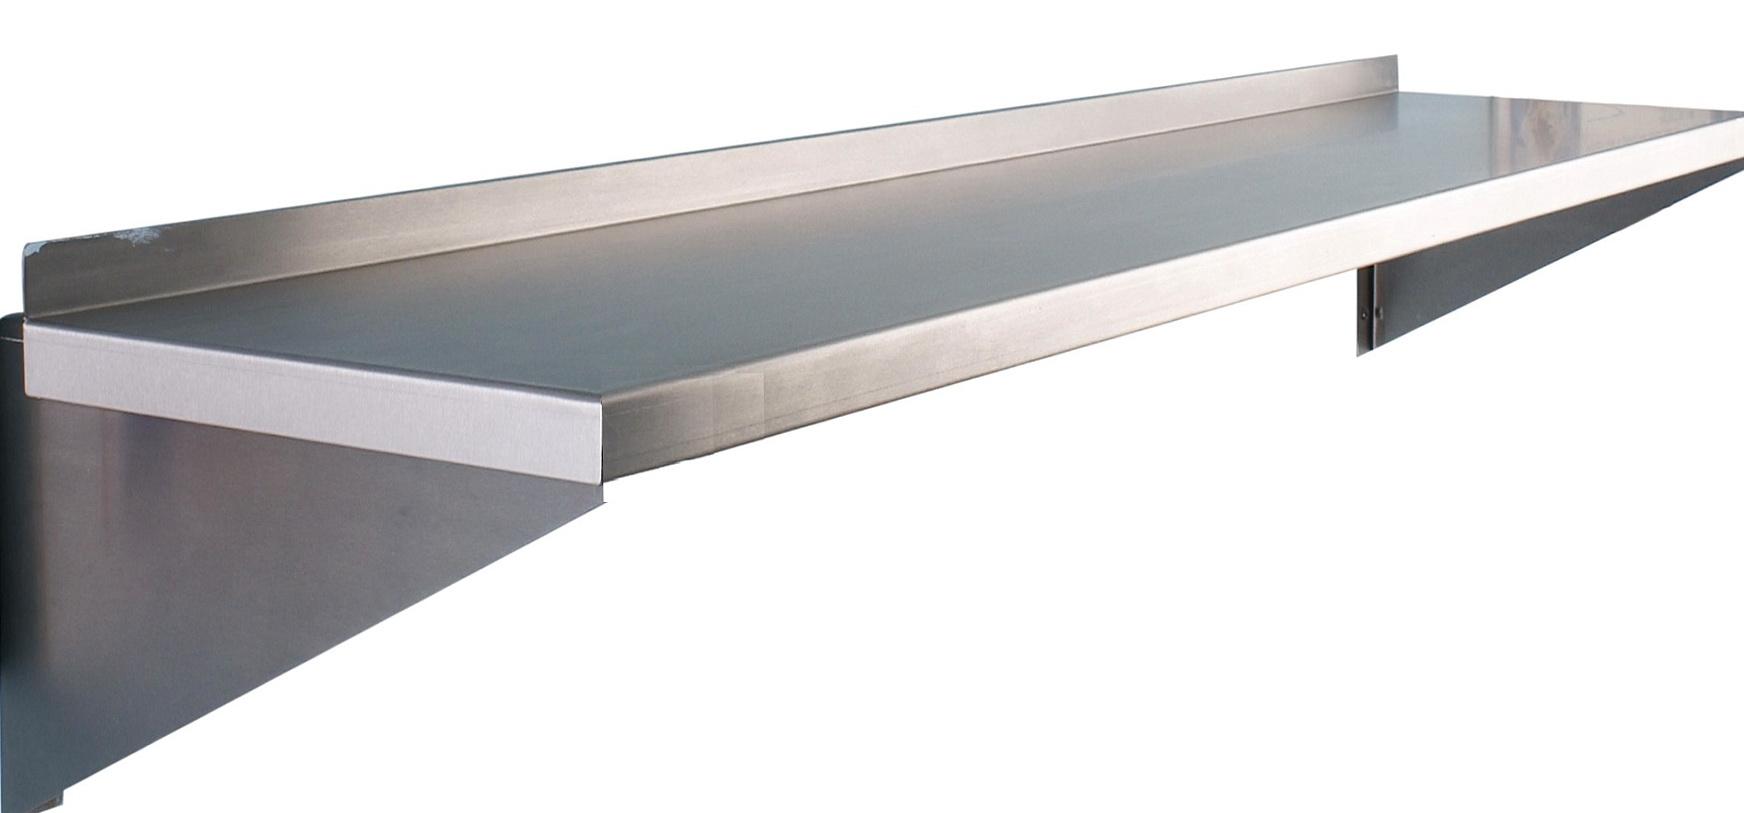 Stainless Steel Kitchen Wall Shelf